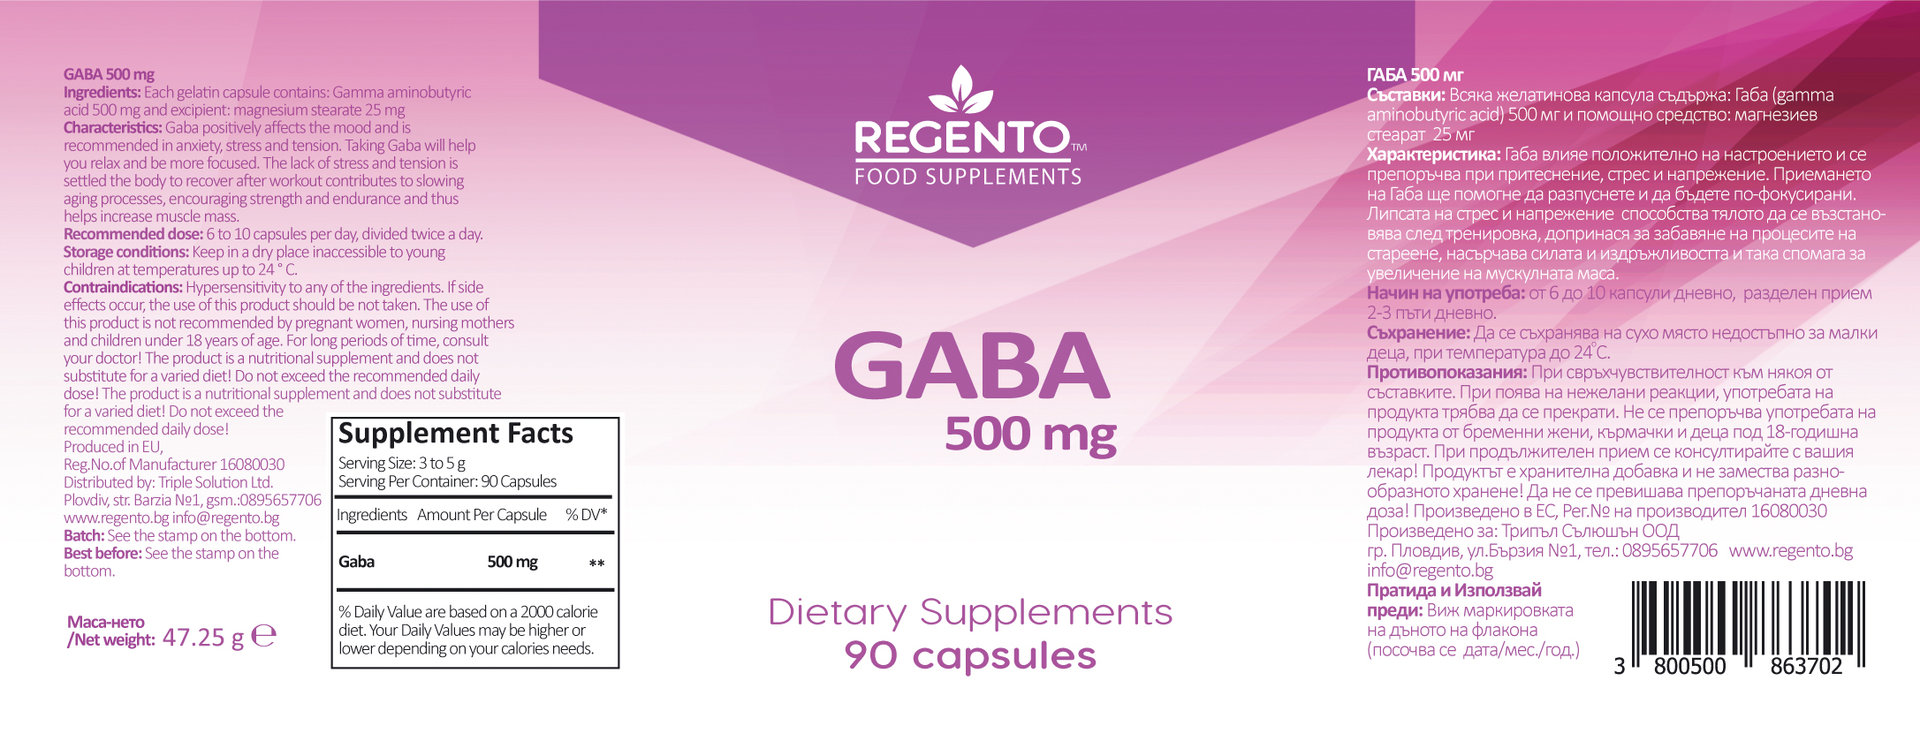 REGENTO GABA 500mg 90 capsules